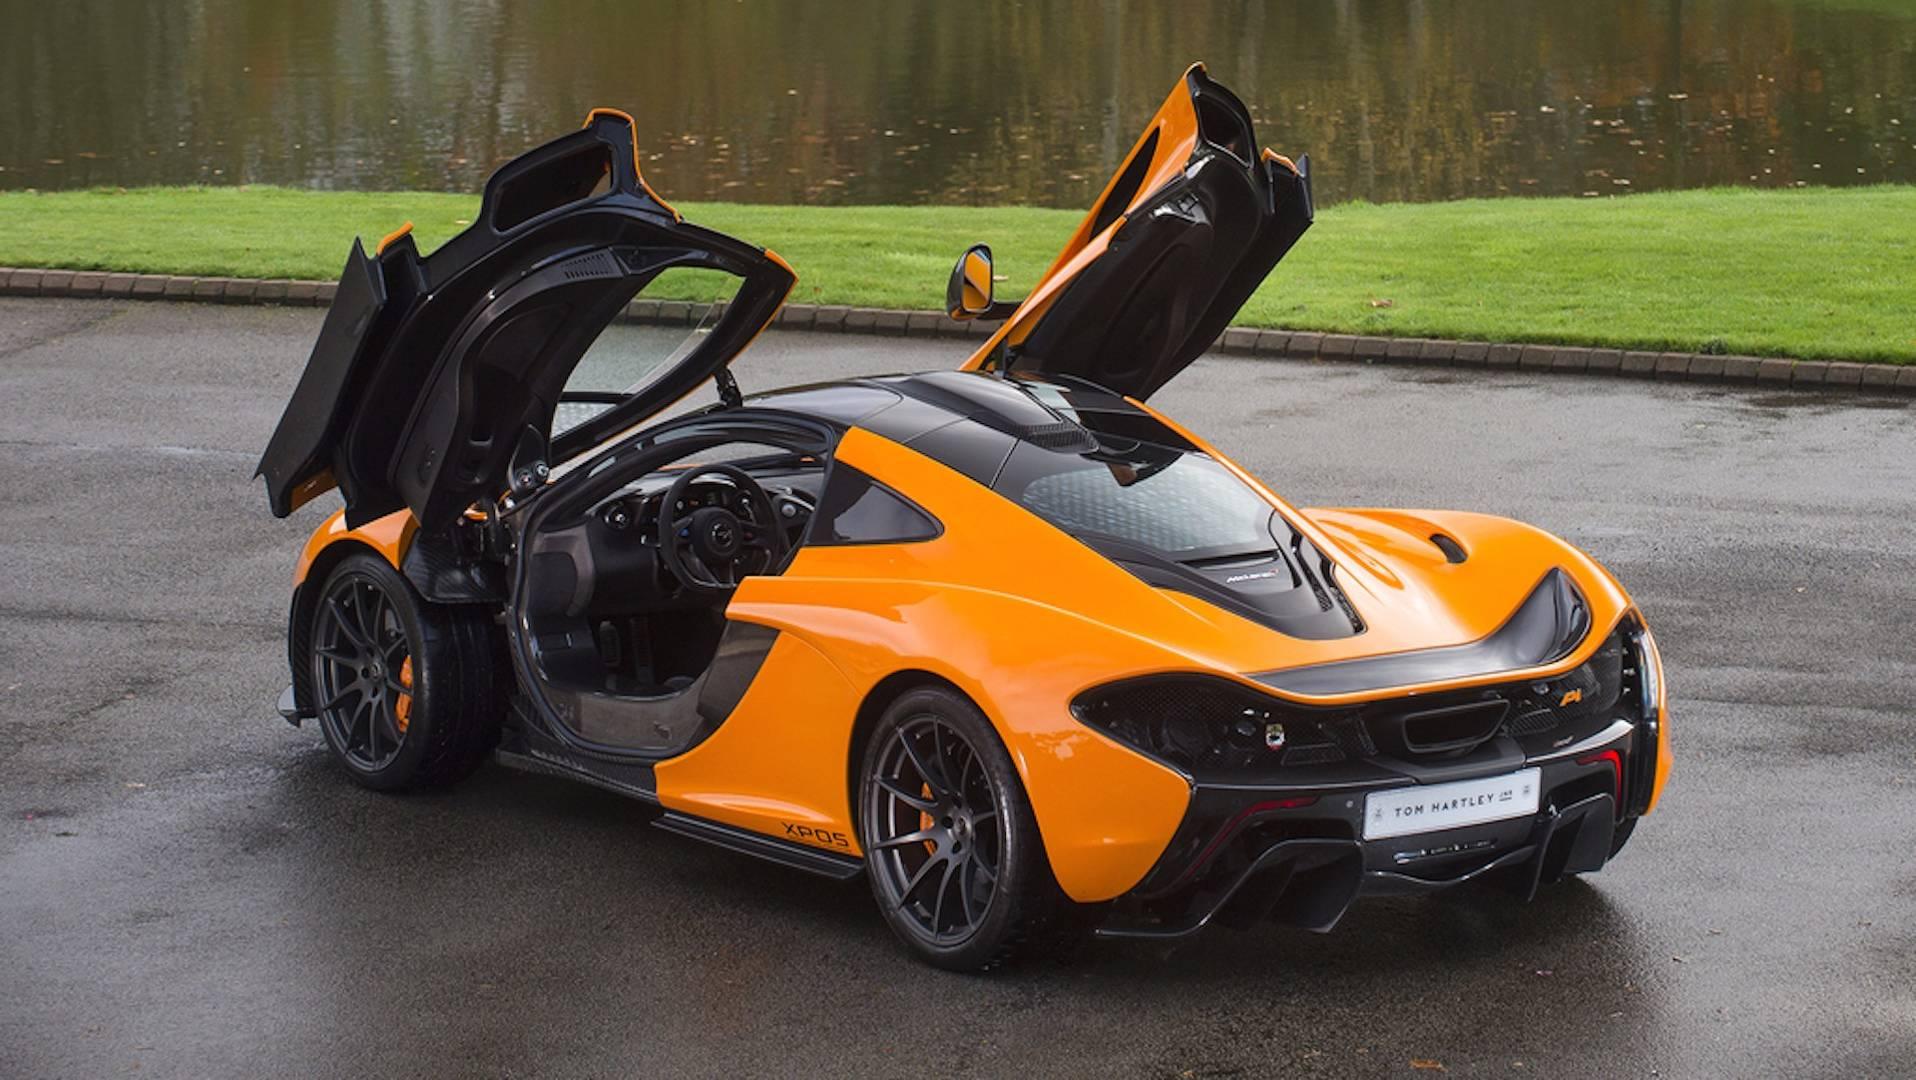 McLaren_P1_Experimental_Prototype_05